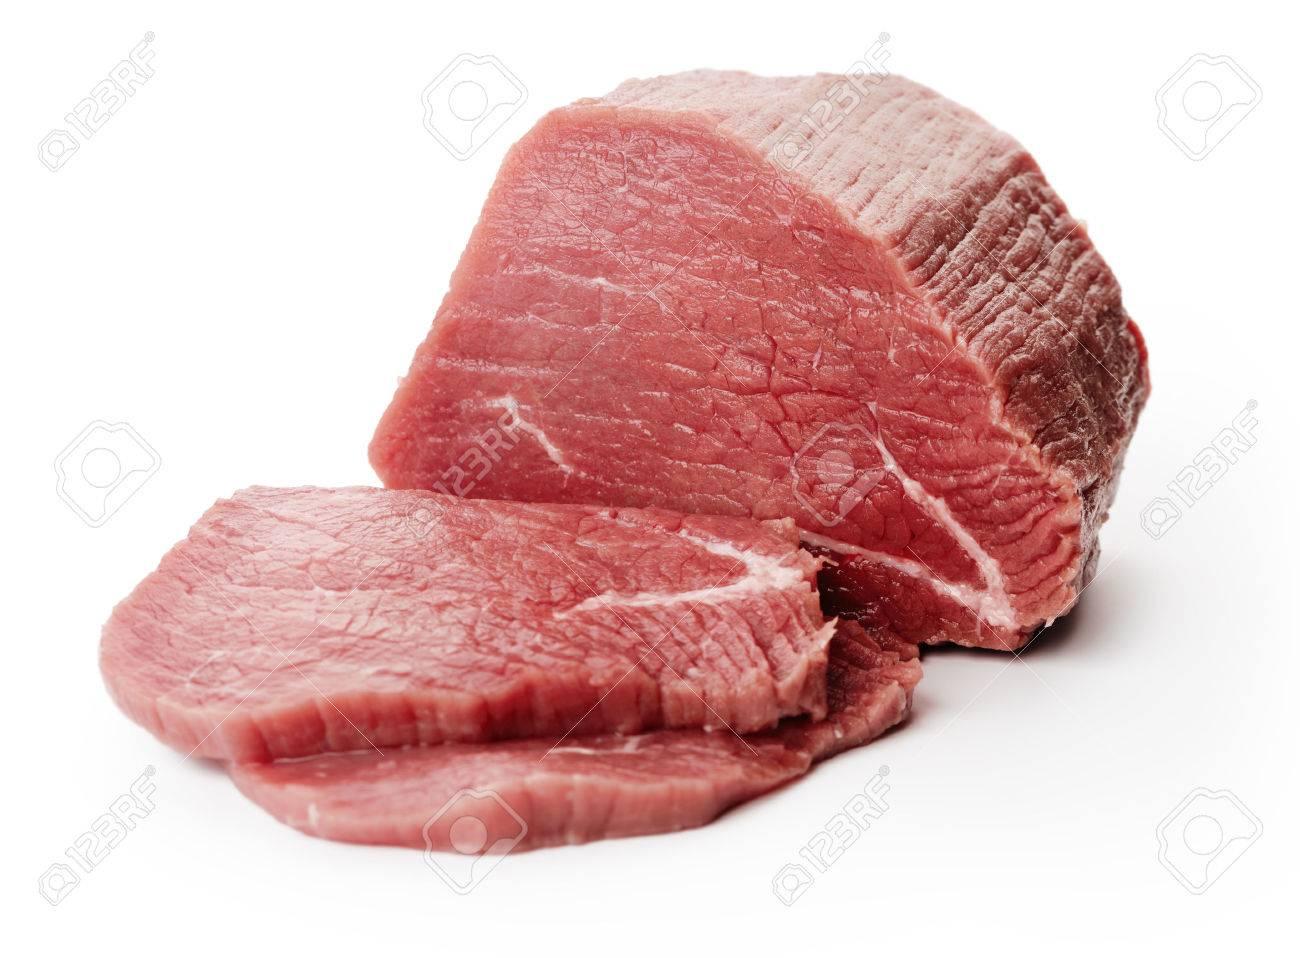 Raw fillet steaks on white - 23006718